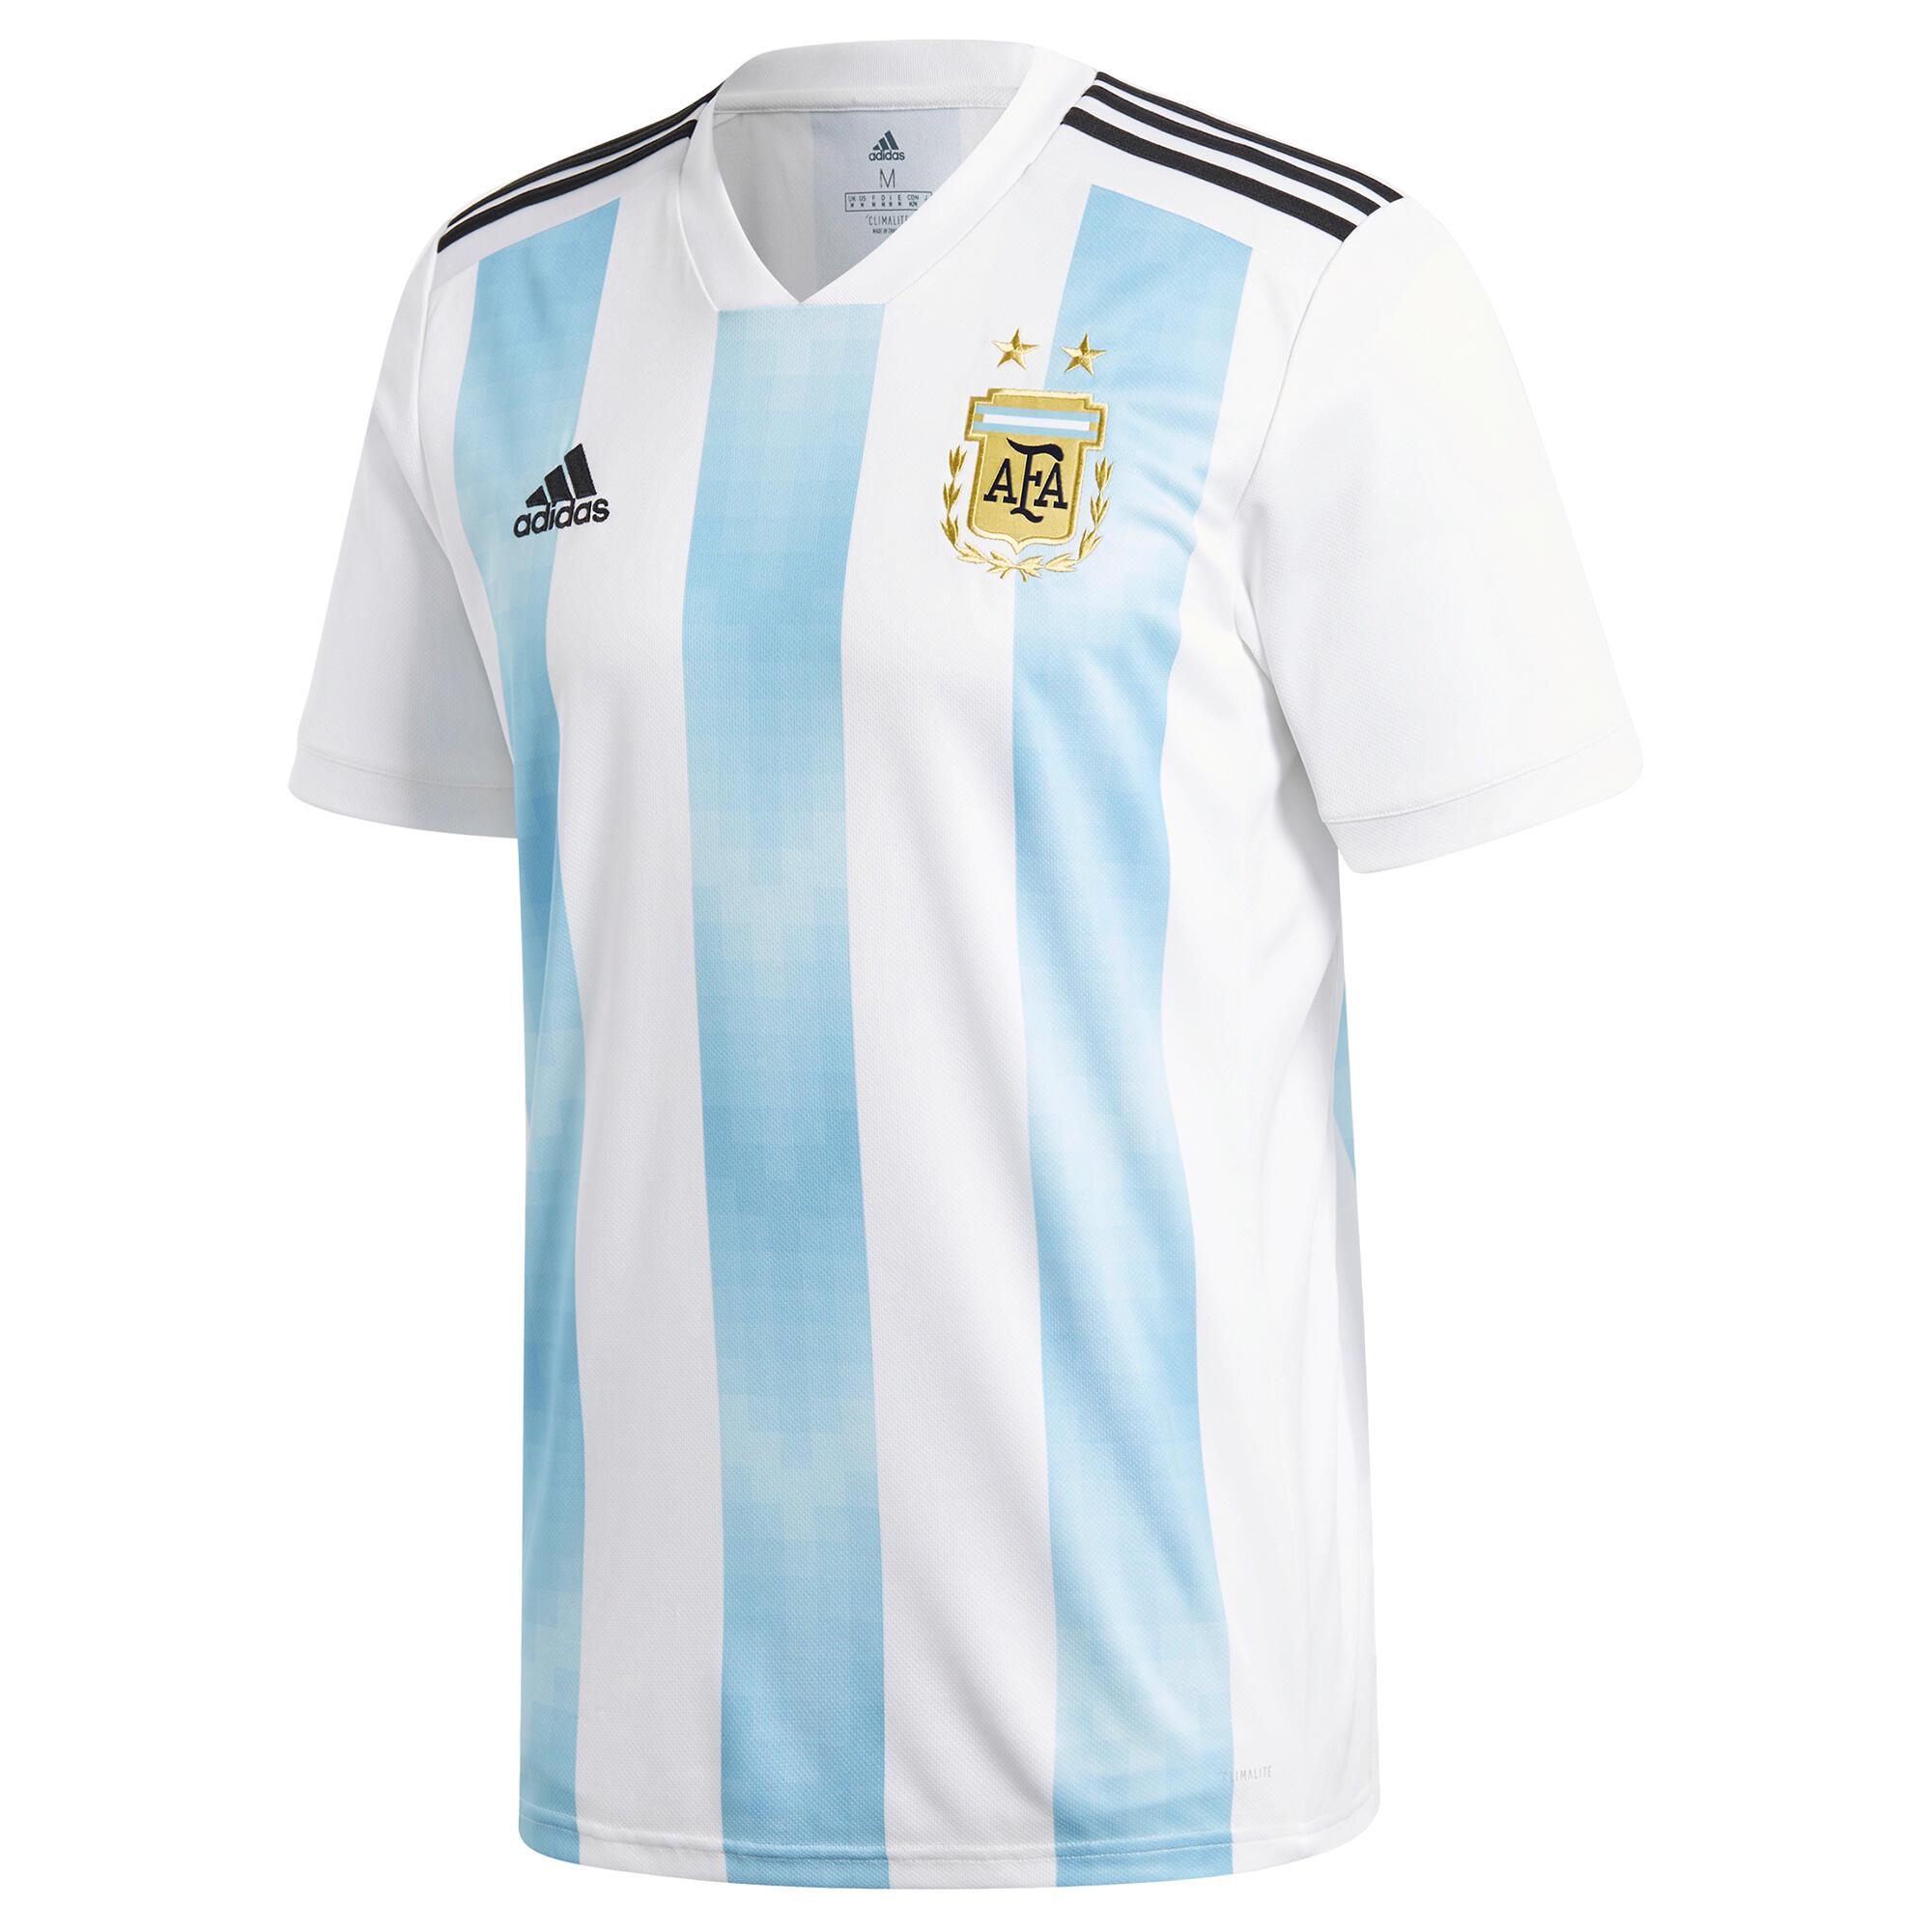 96905912be3 Argentinië fanshop kopen? | Decathlon.nl